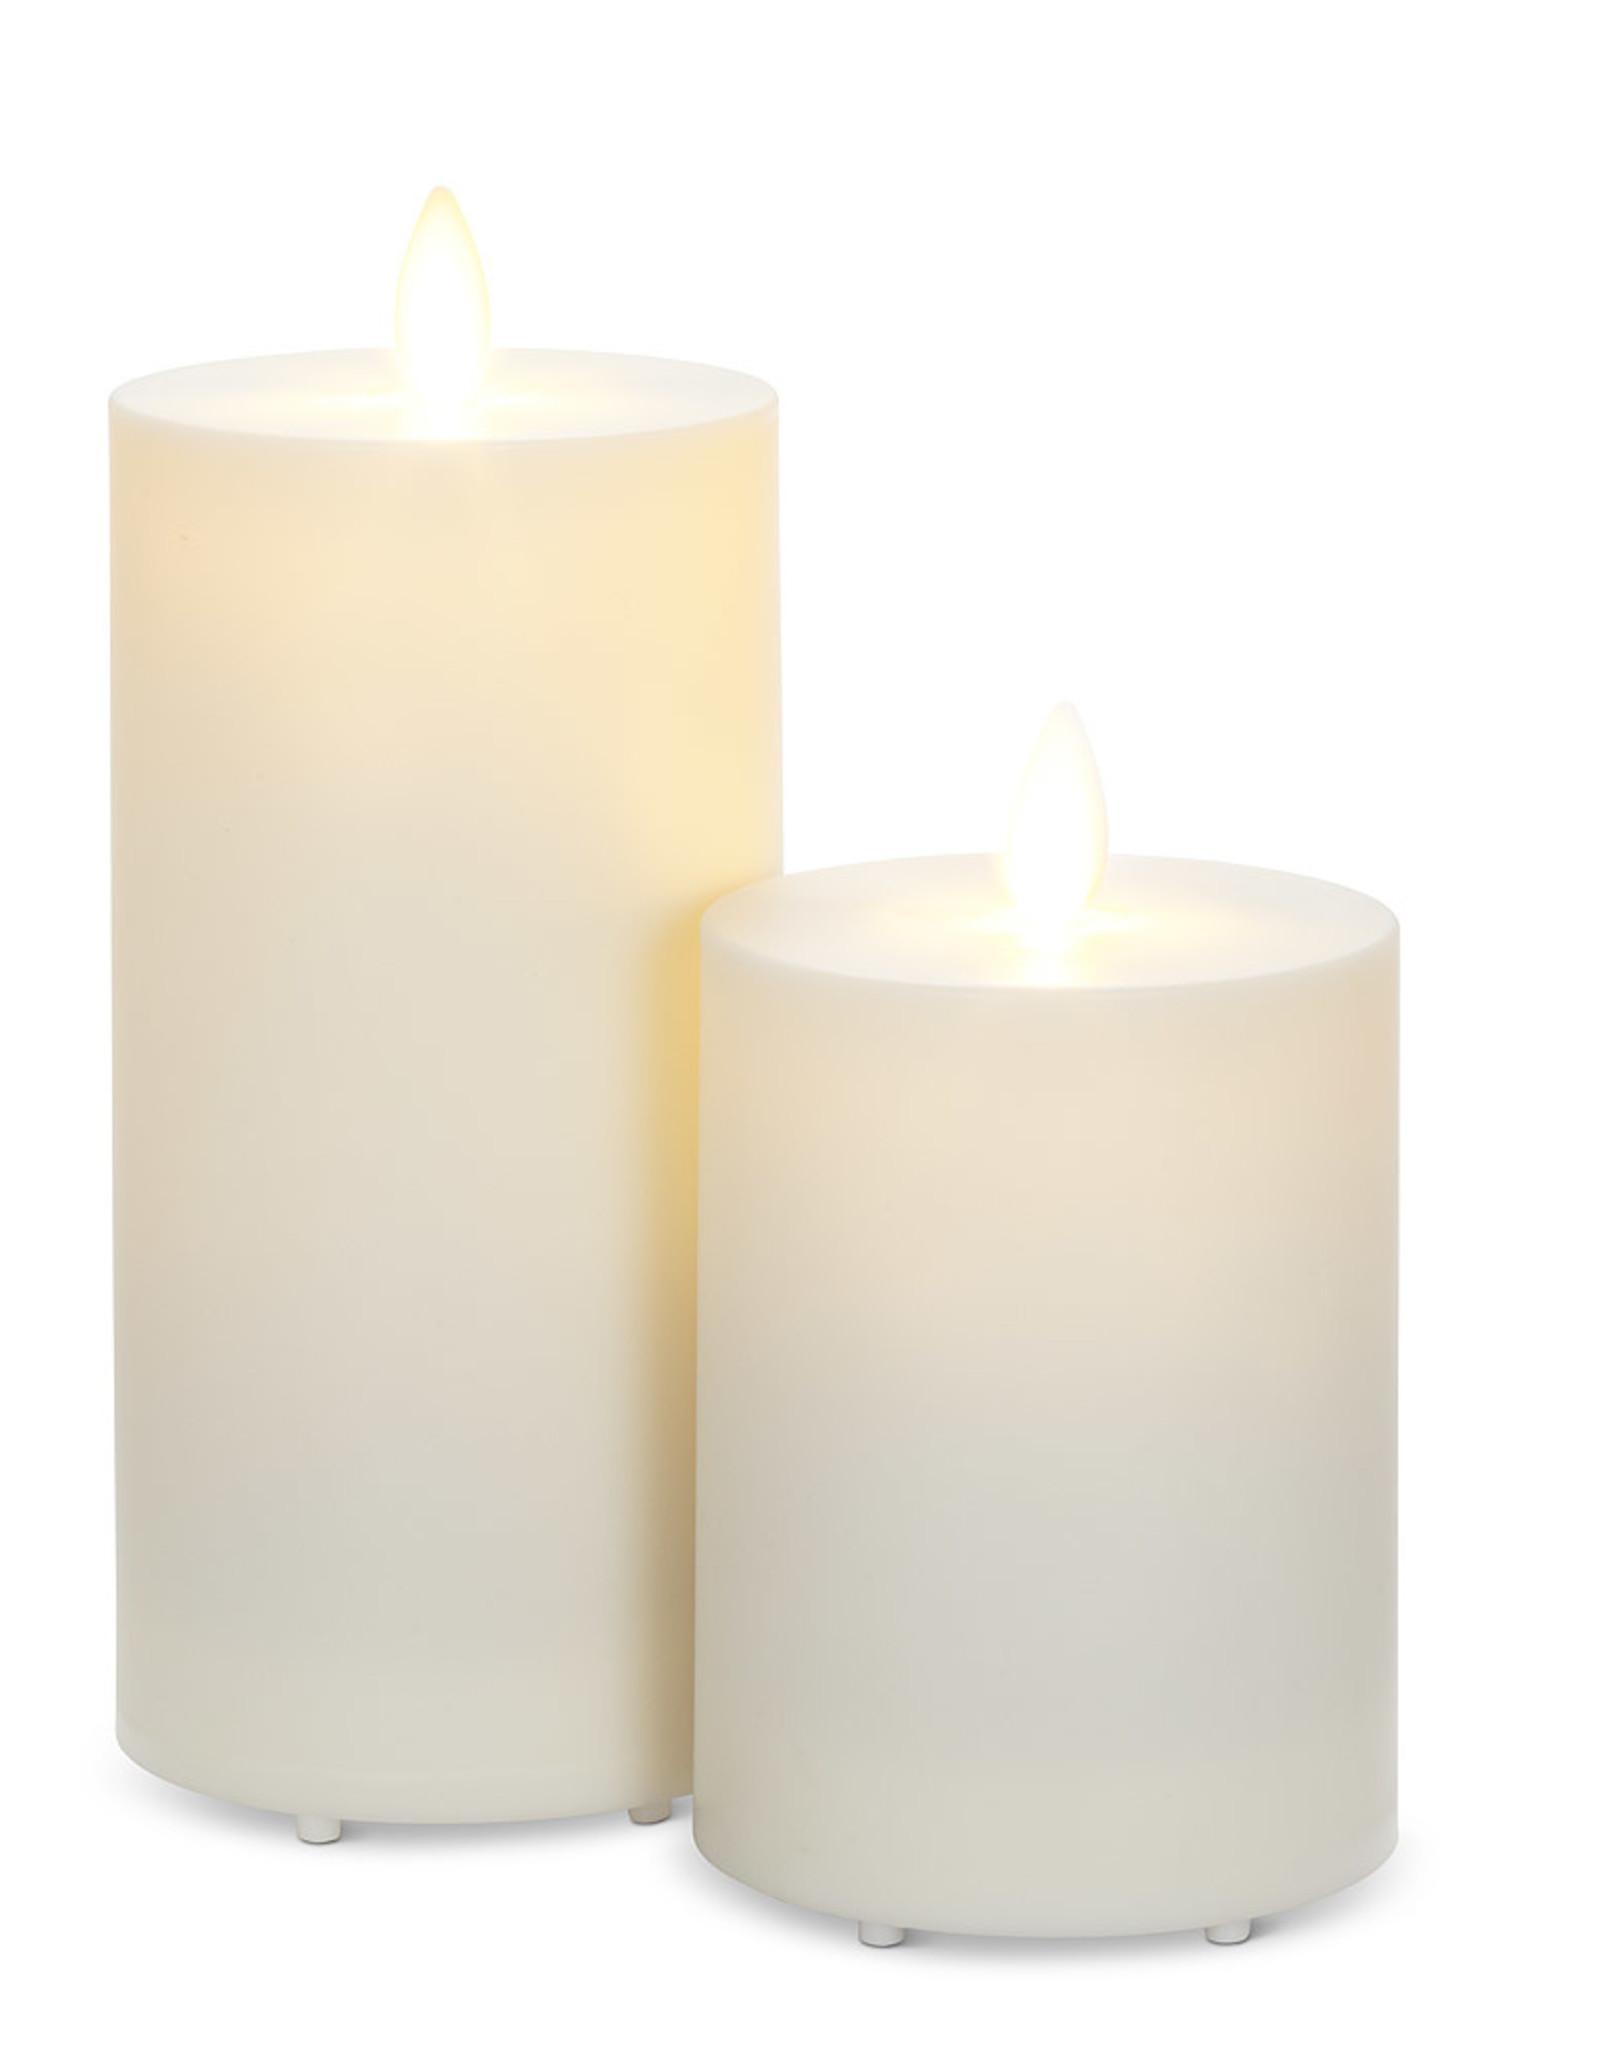 Rainlite Outdoor Candle 3 x 5''